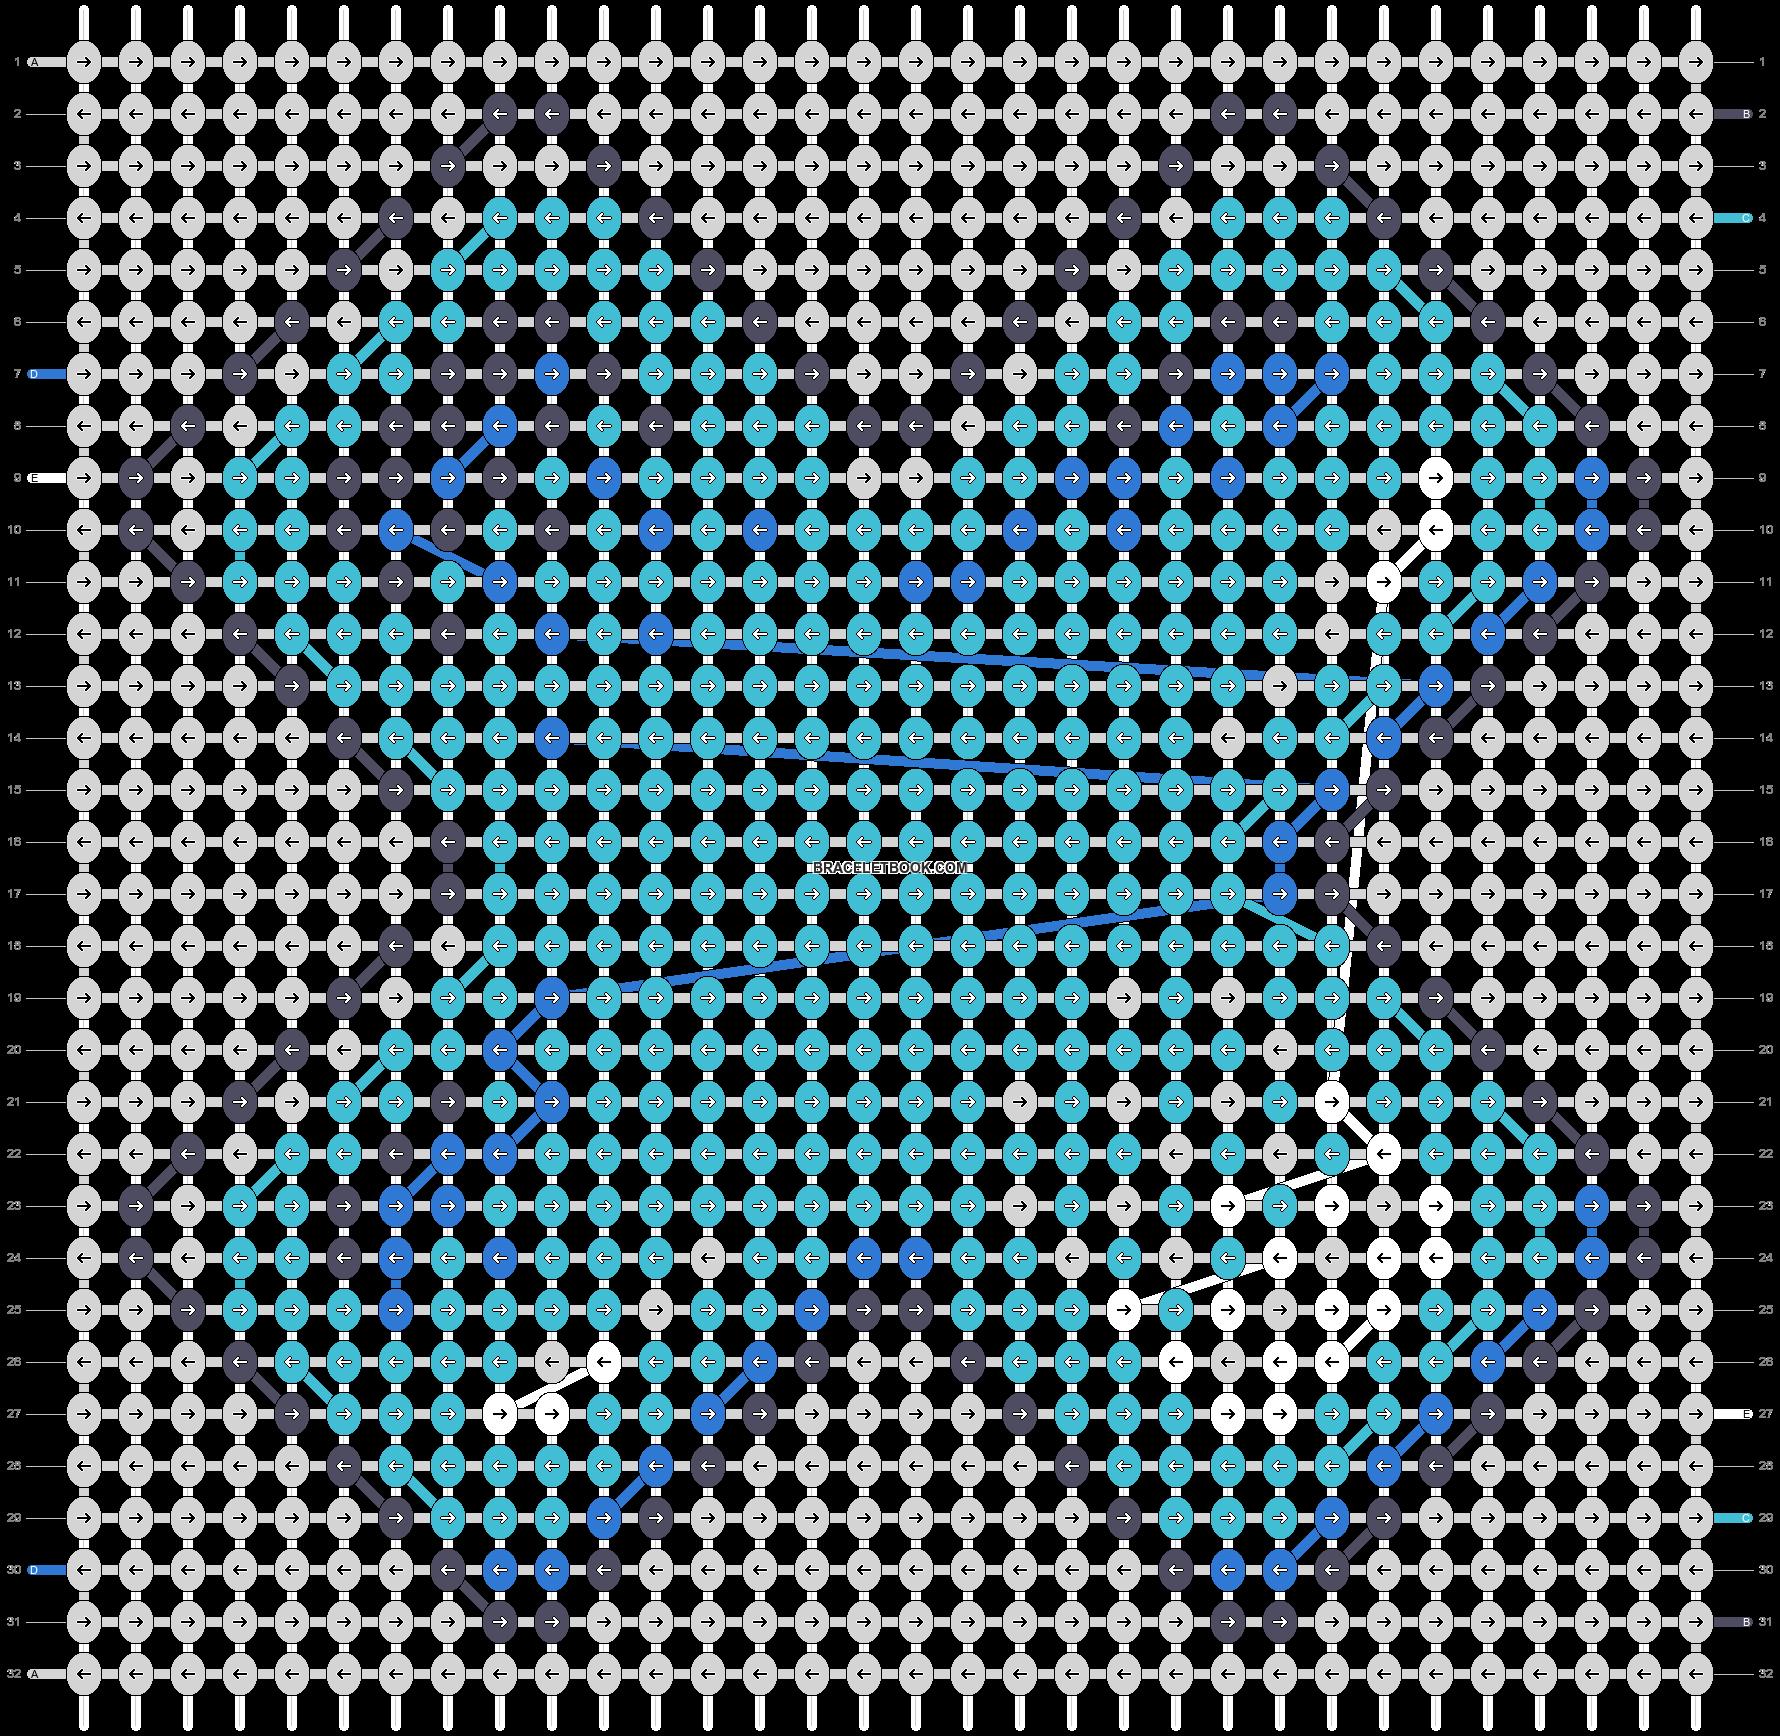 Alpha Pattern #21899 added by biancaplem